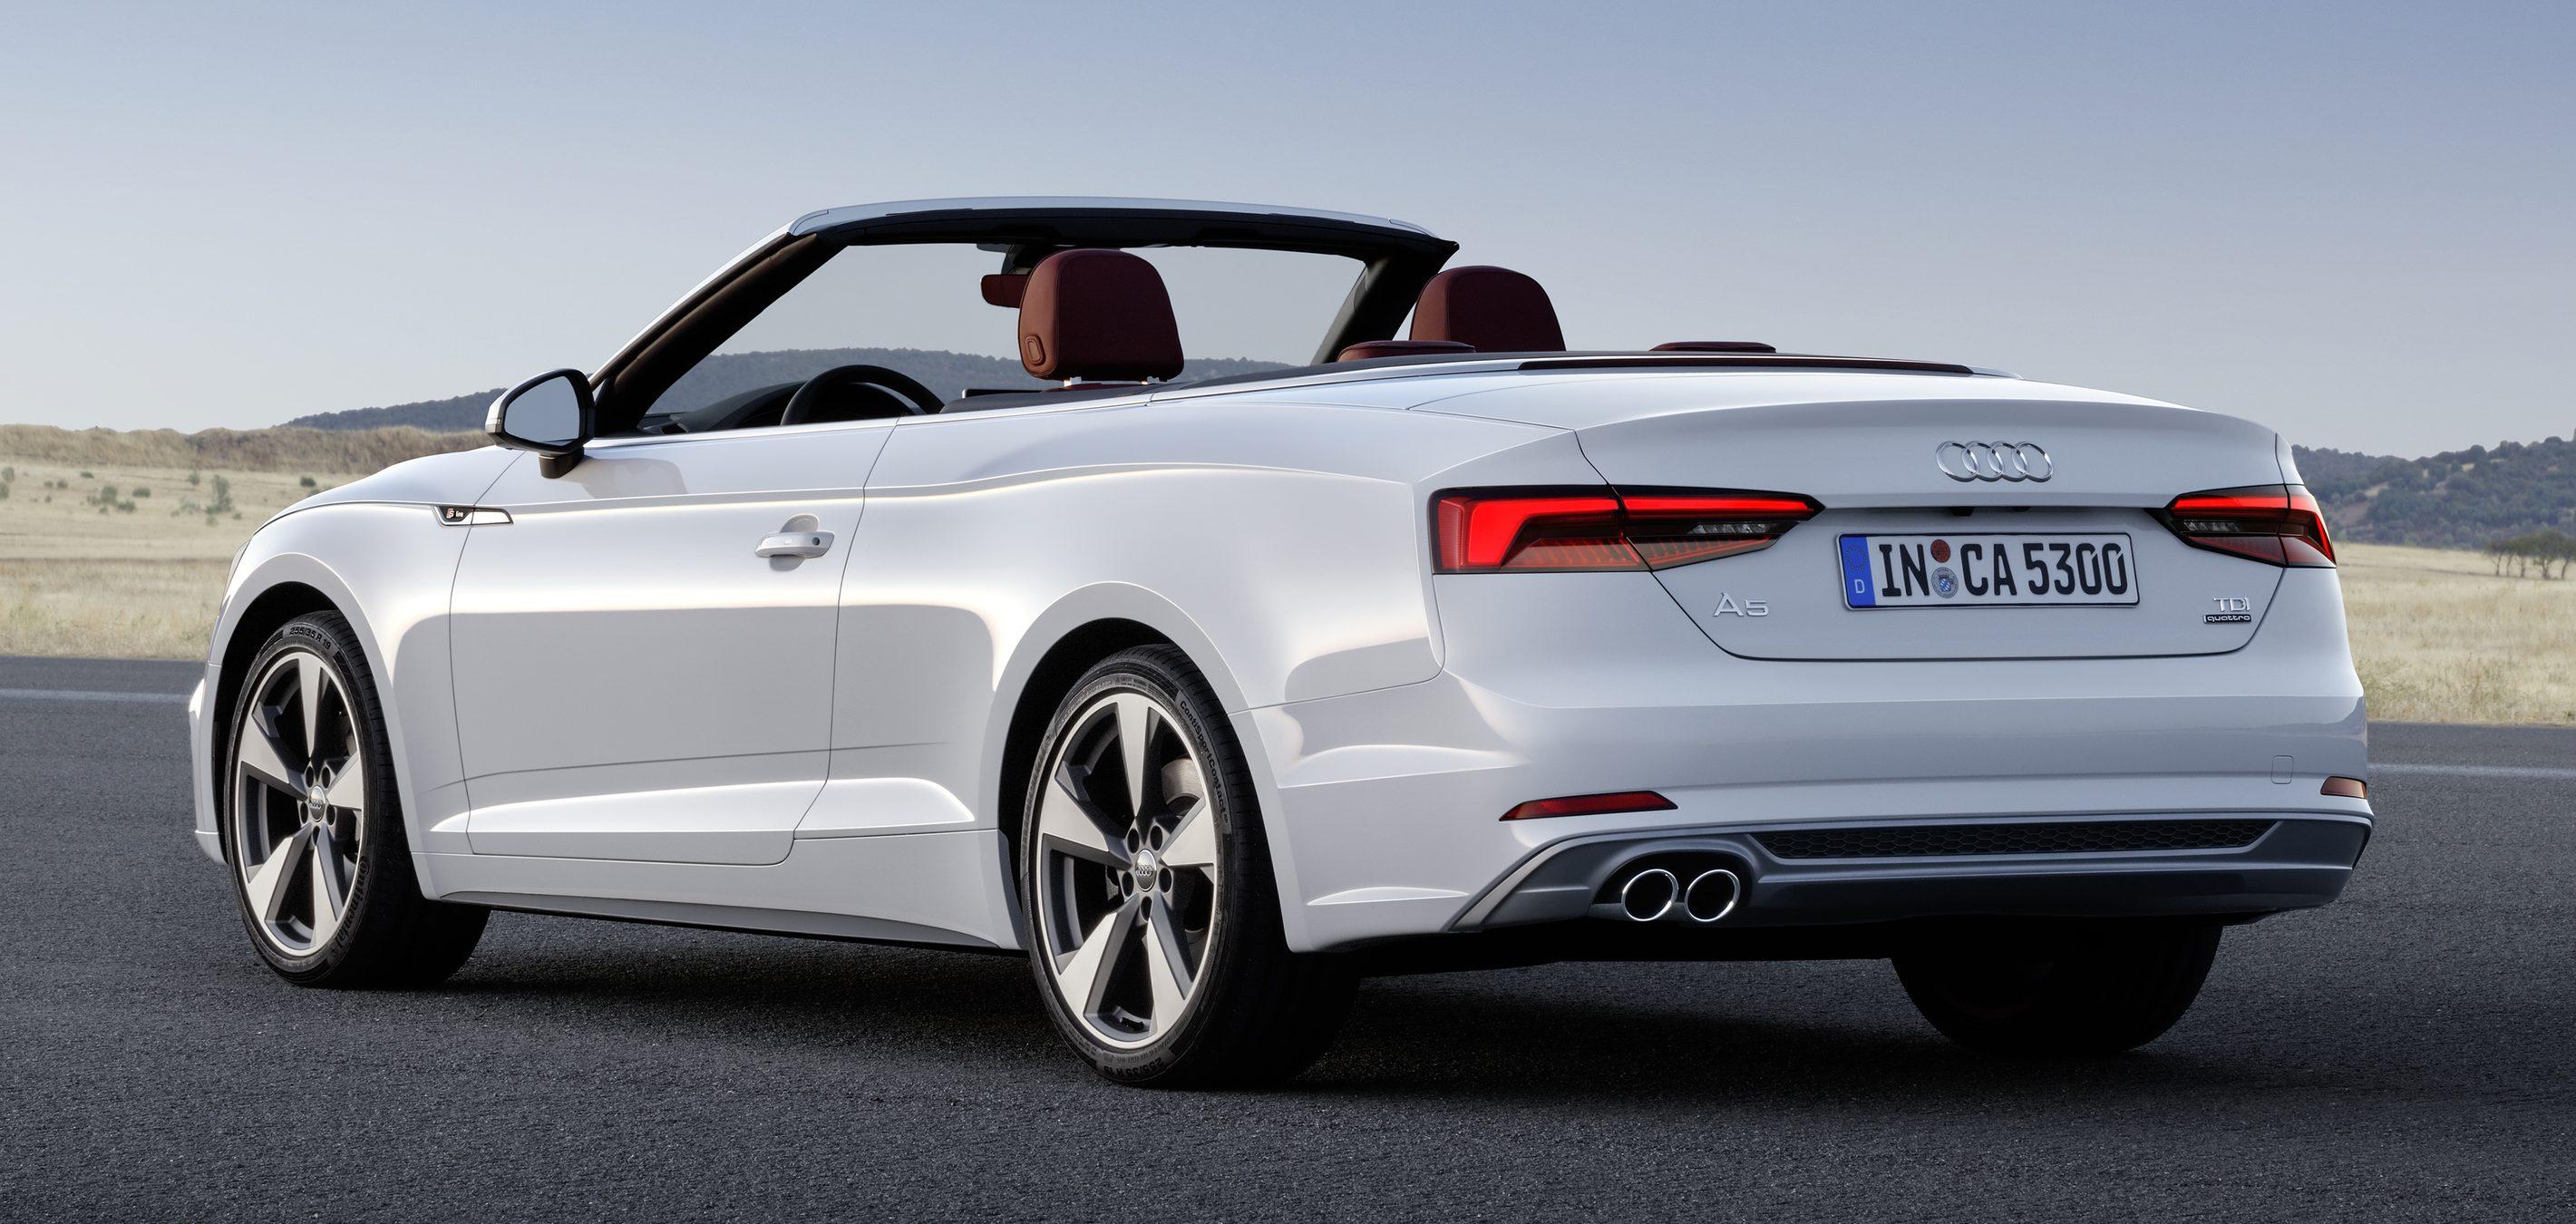 A5家族全新敞篷车,audi A5 Cabriolet 与 S5 Cabriolet。 Audi A5